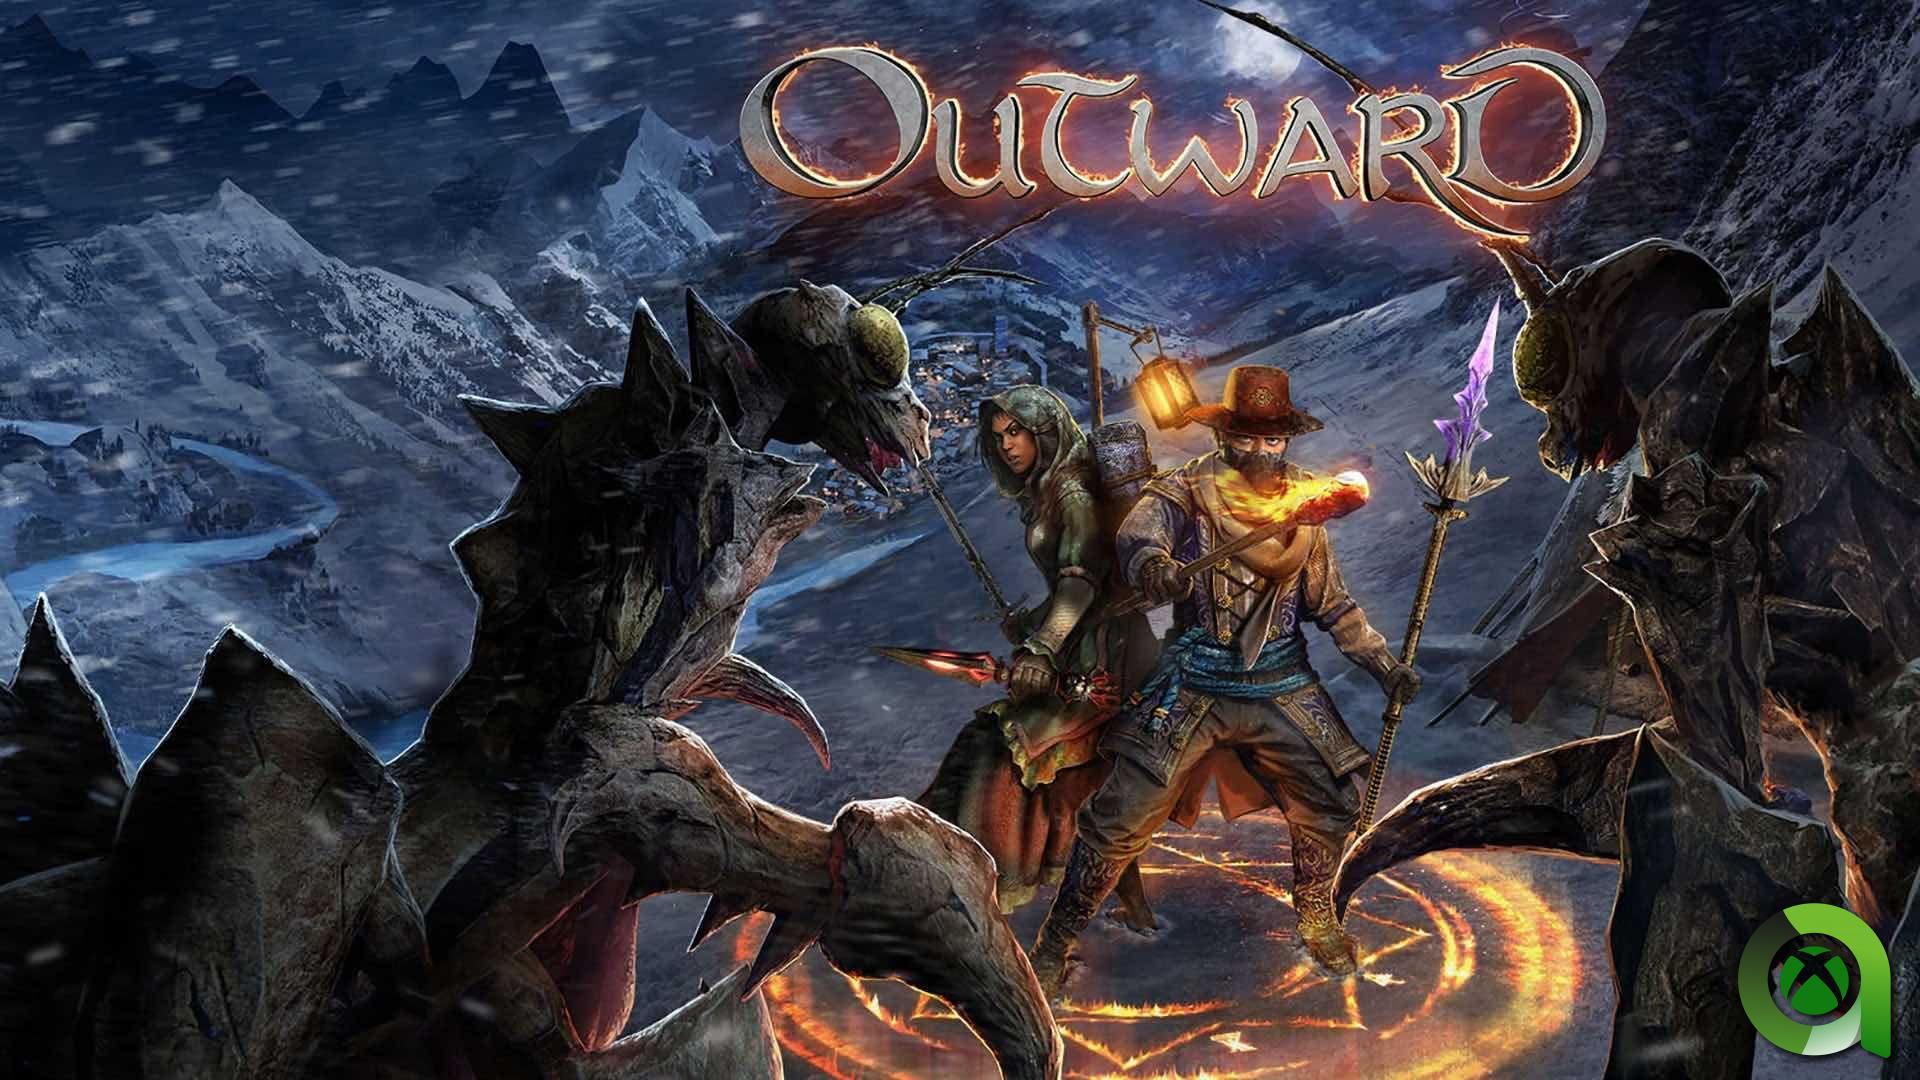 Outward: The Sorobeans